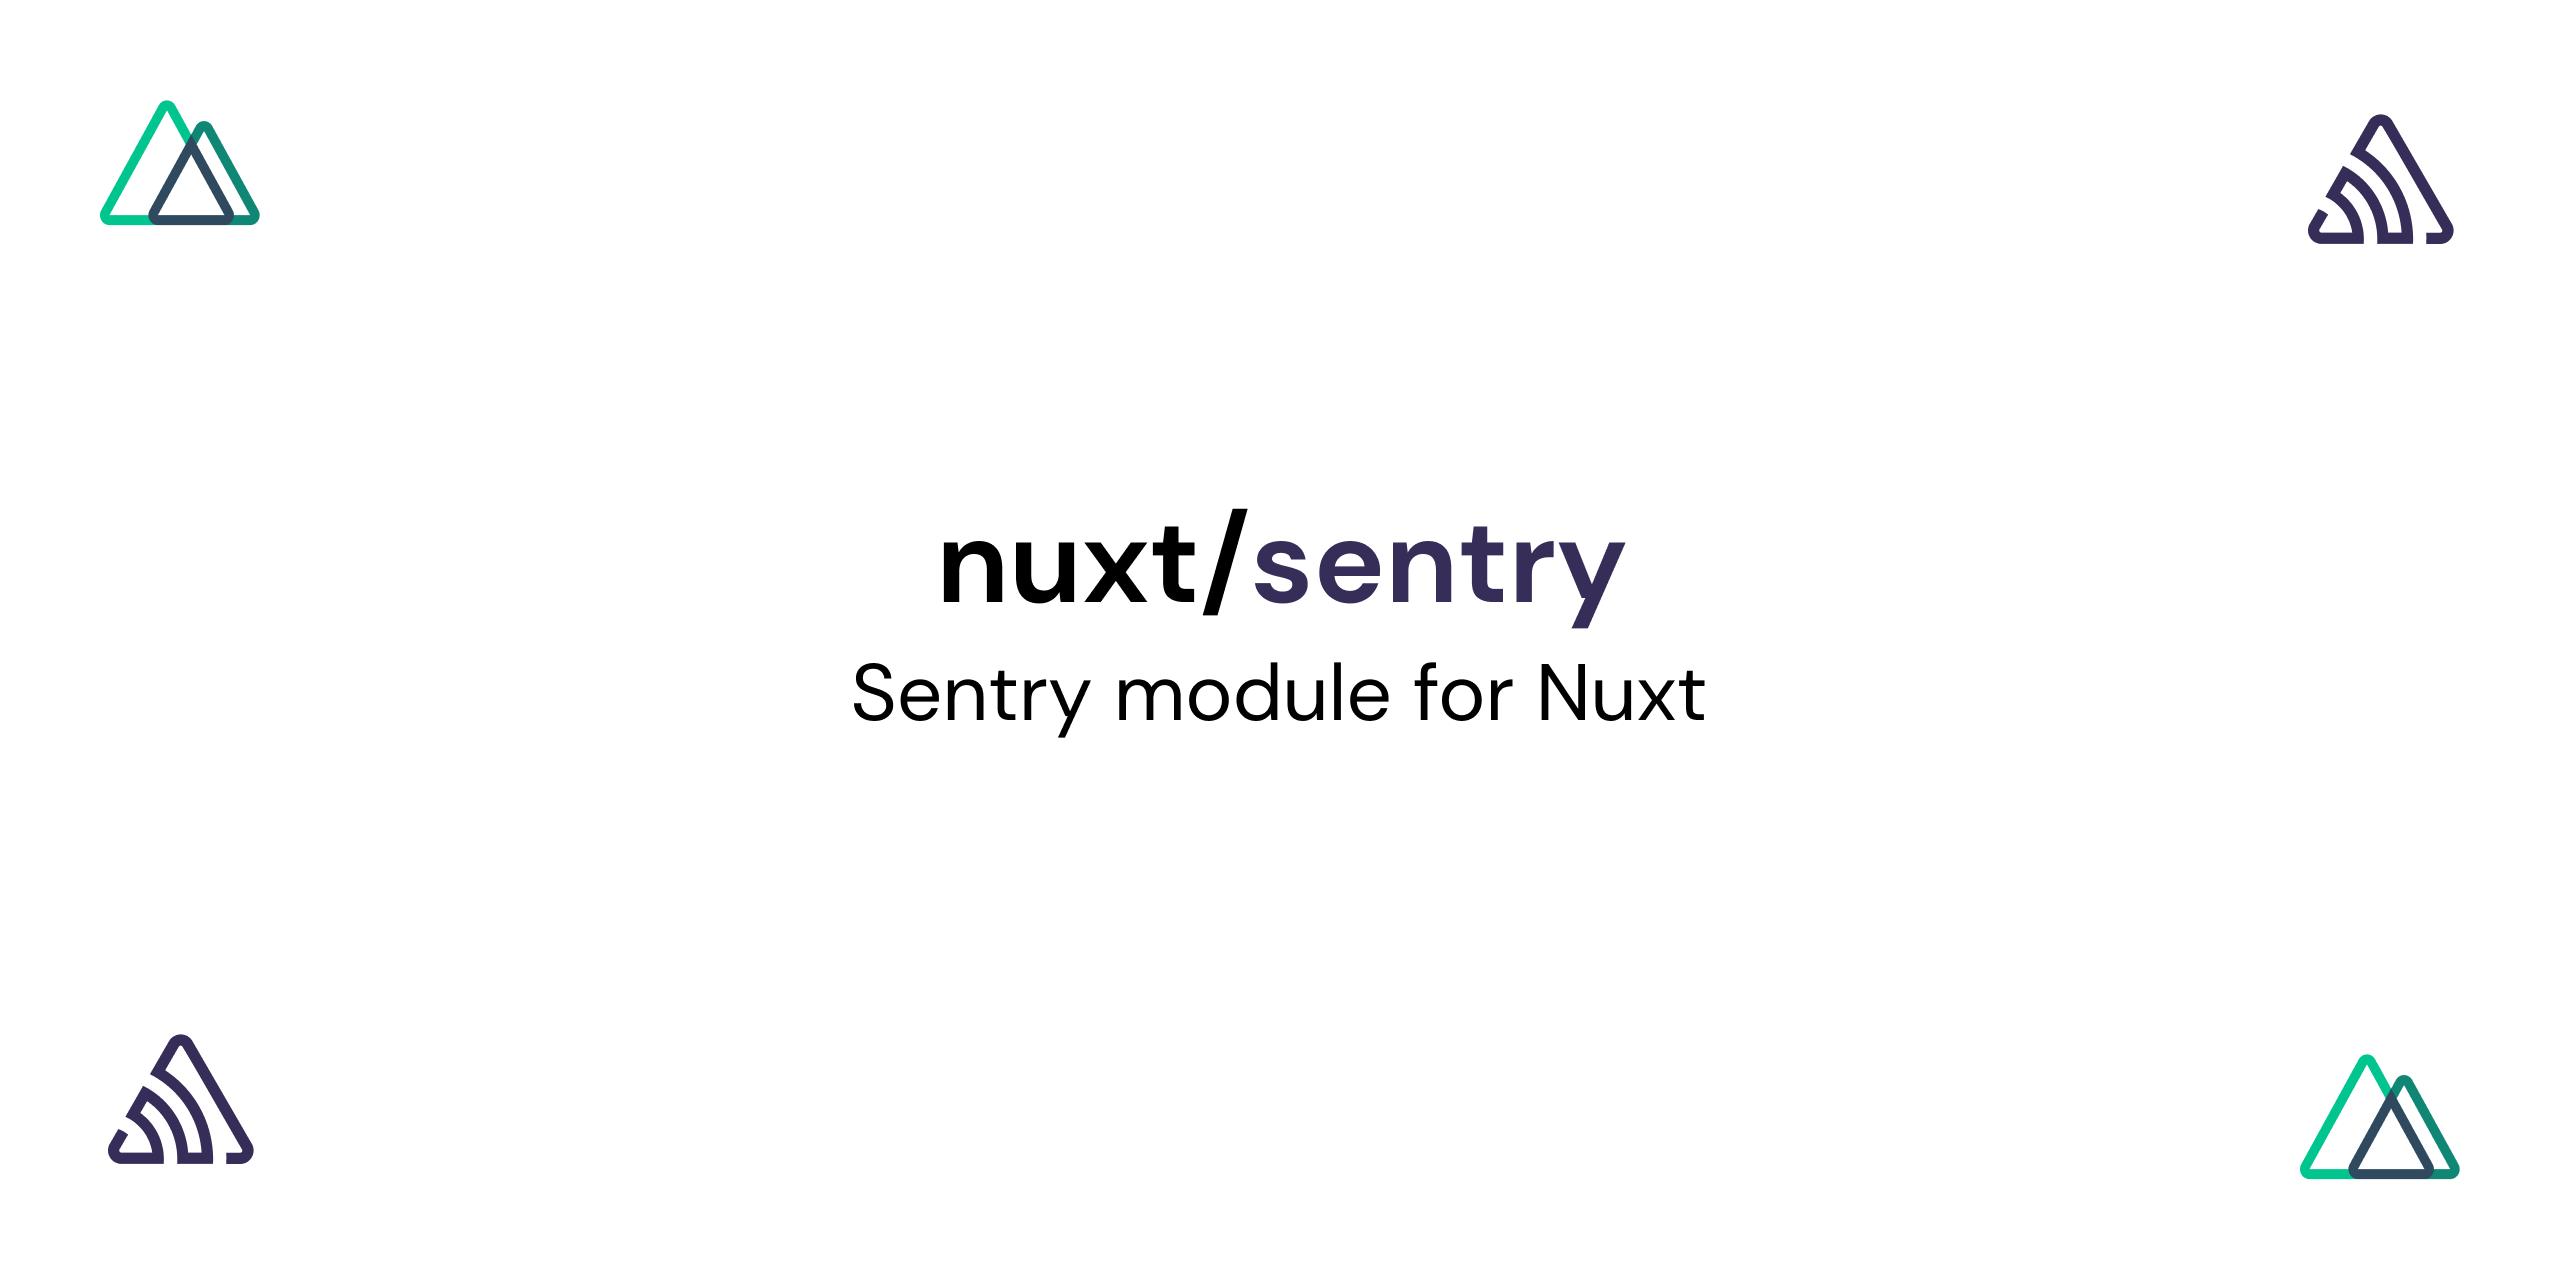 @nuxtjs/sentry